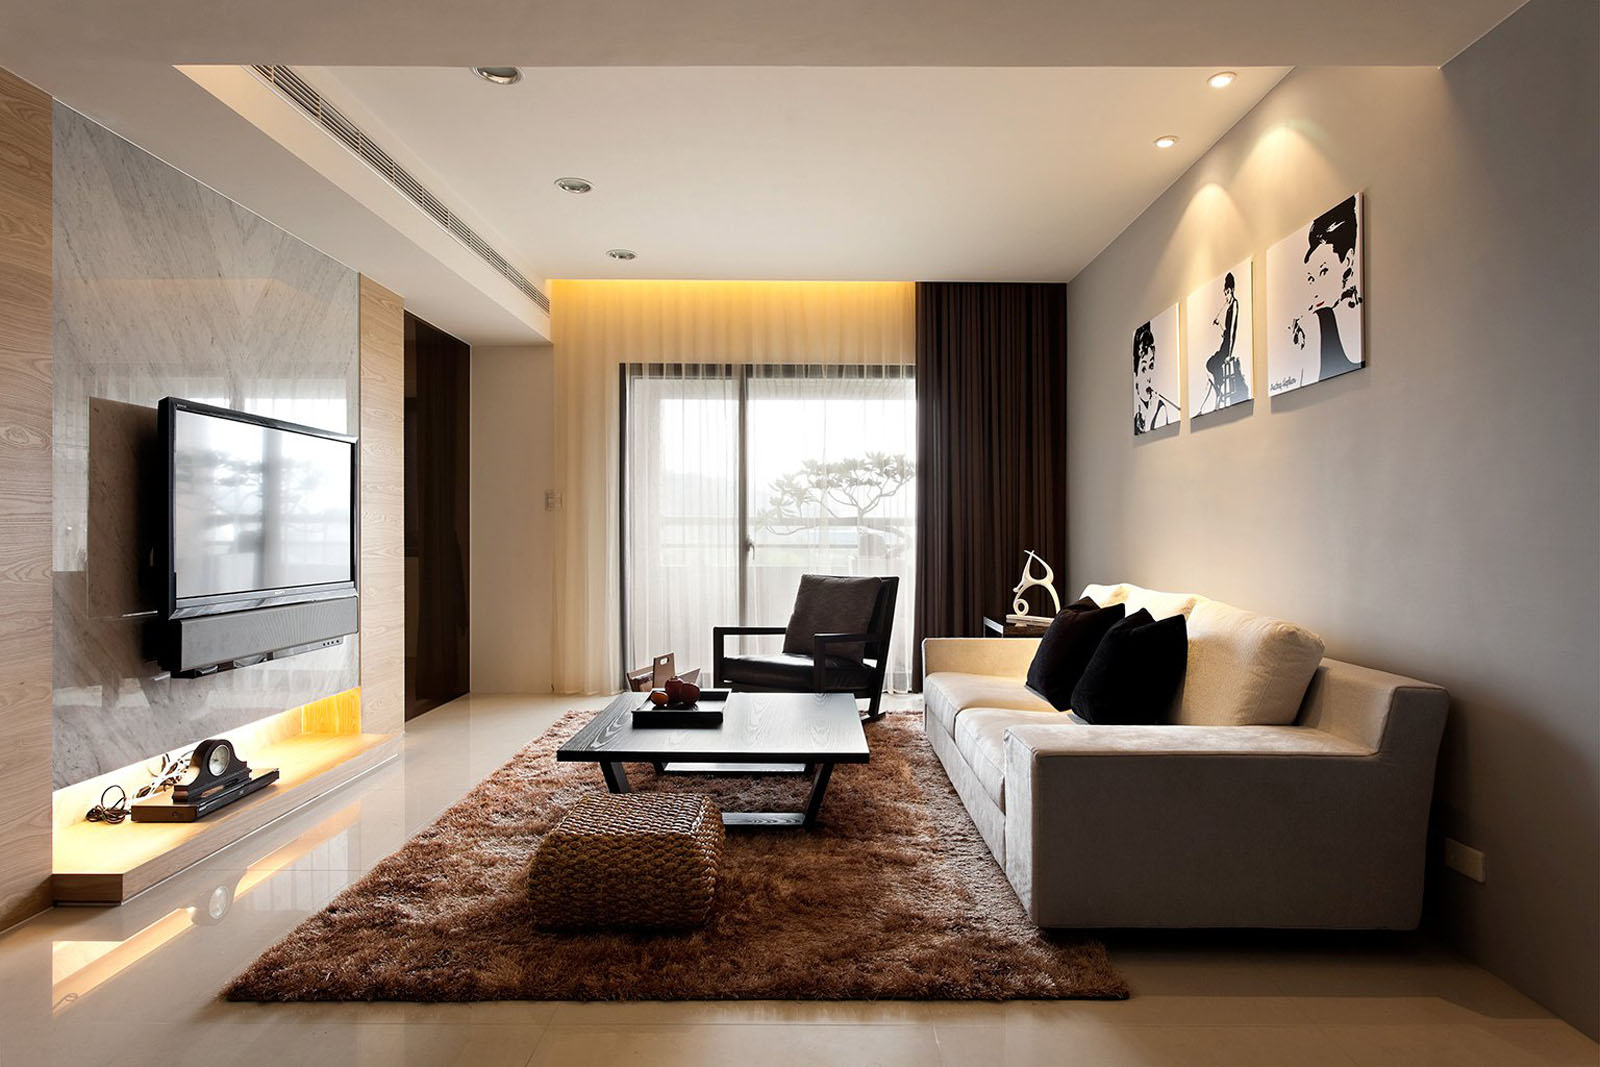 Дизайн общей комнаты в квартире